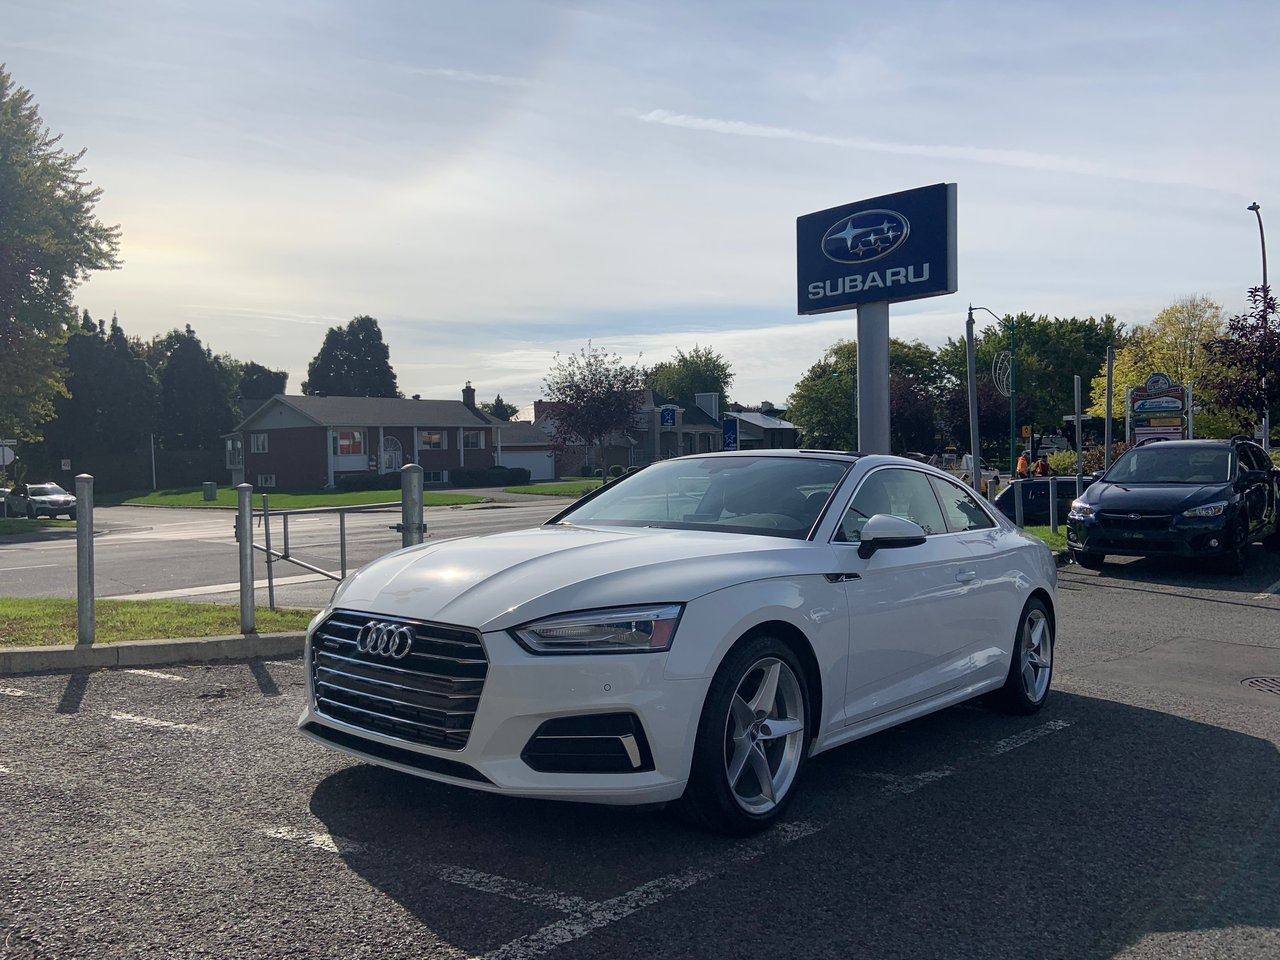 Audi A5 2018 KOMFORT,TOIT OUVRANT PANORAMIQUE,VOLANT CHAUF